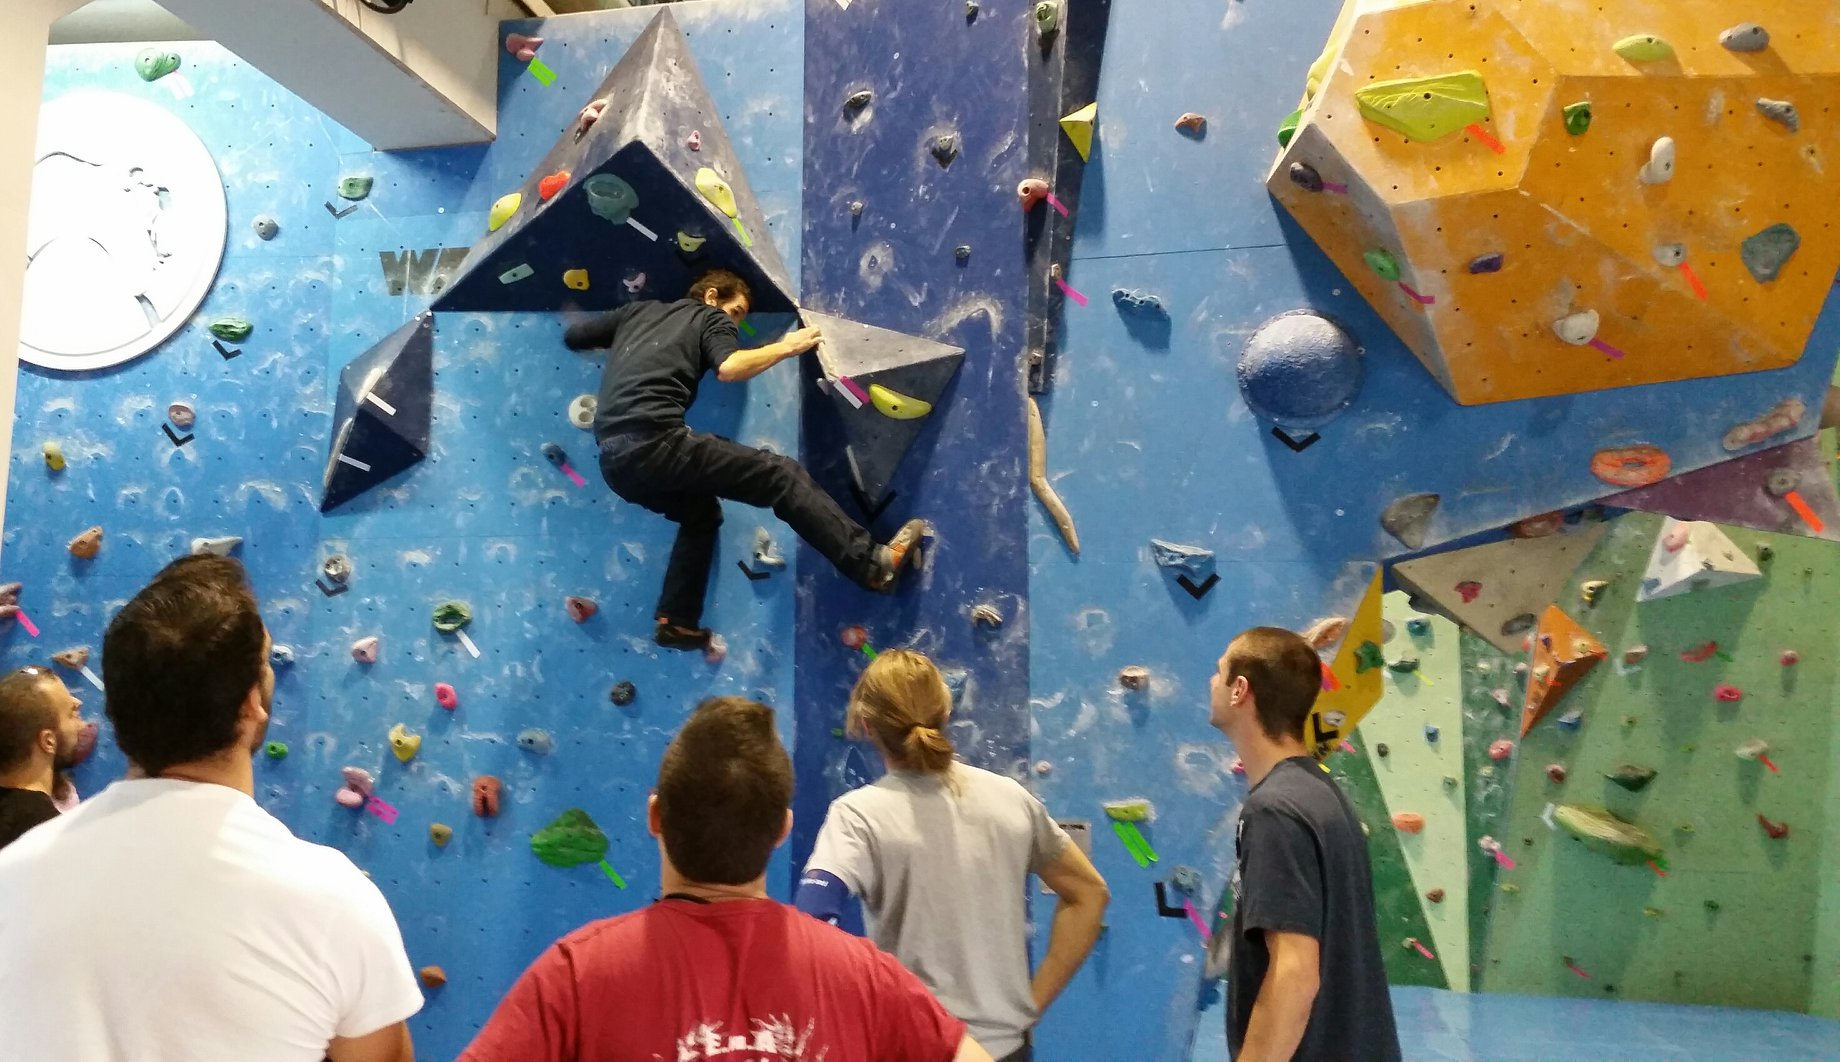 King Kong Climbing